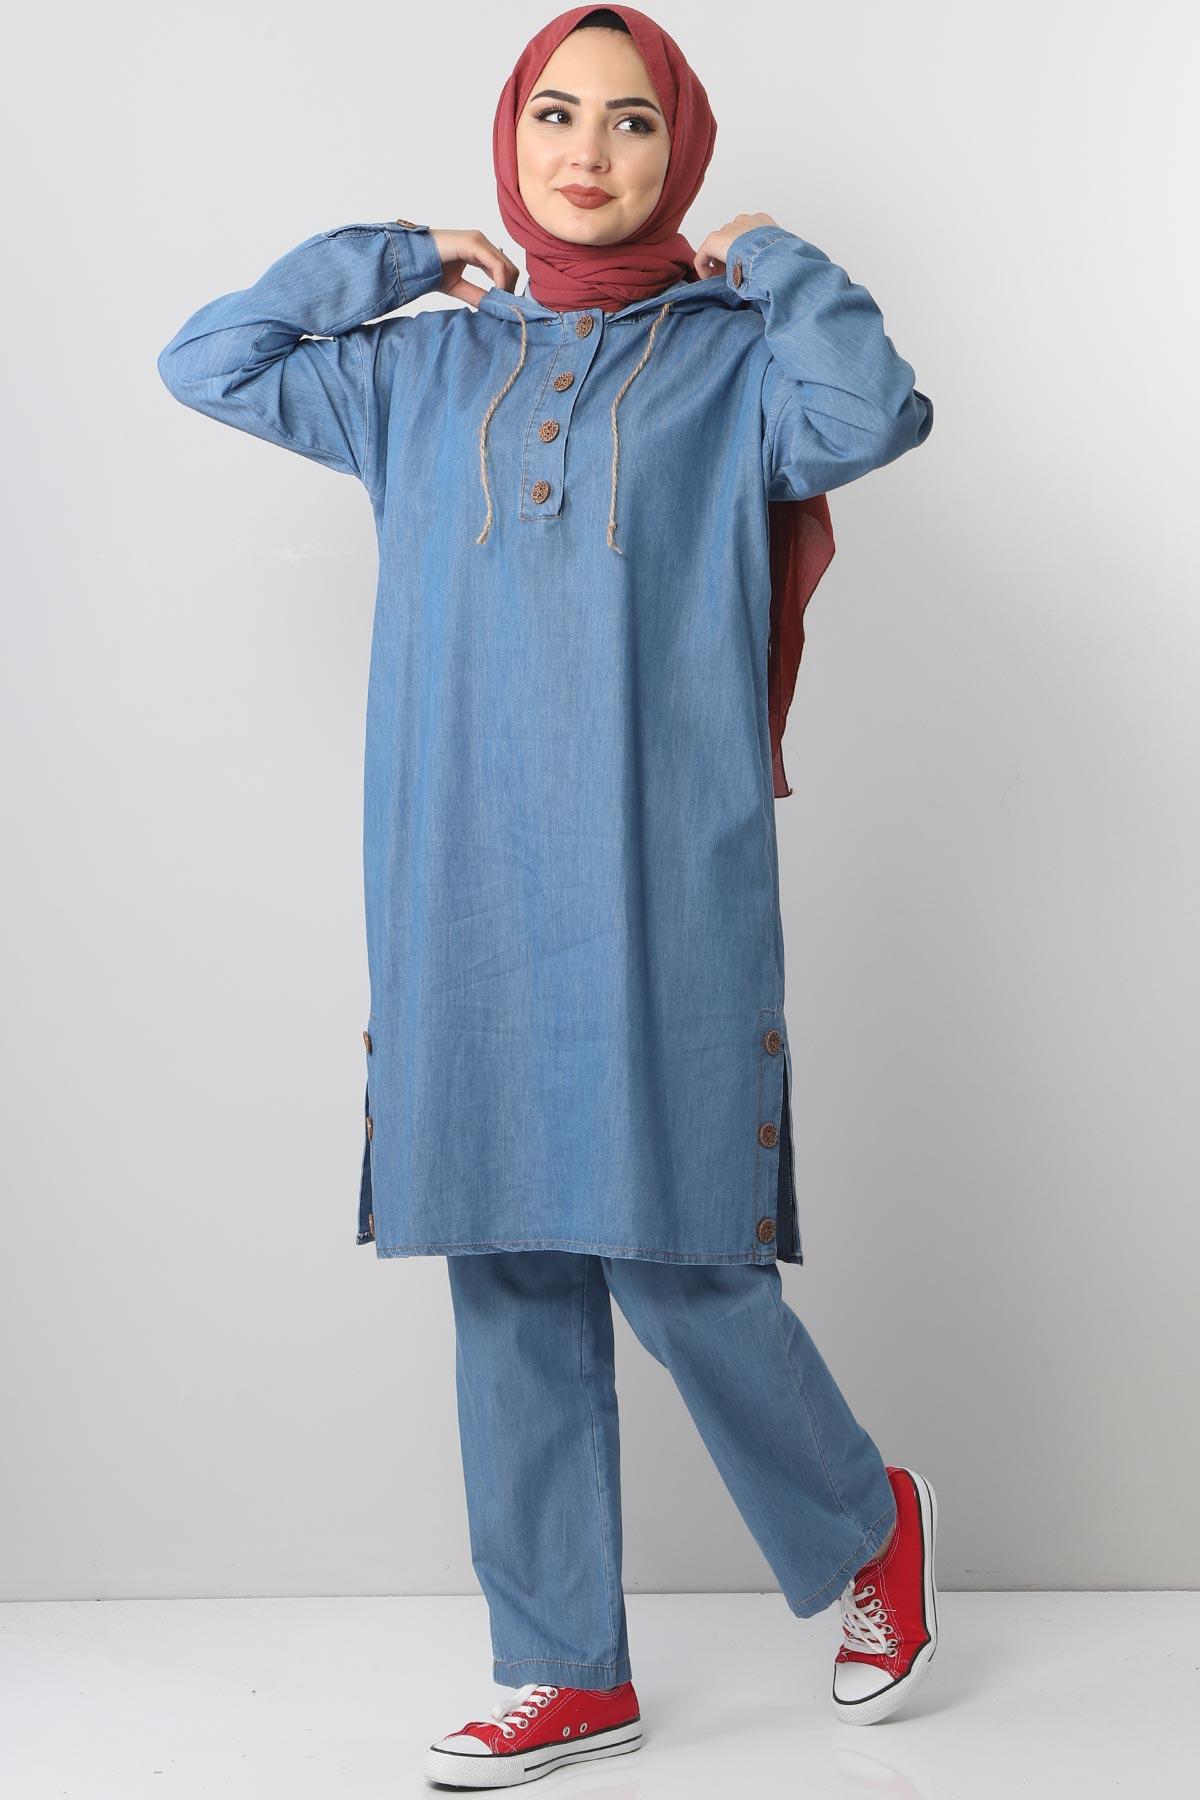 Jeans Suit TSD0454 Light Blue